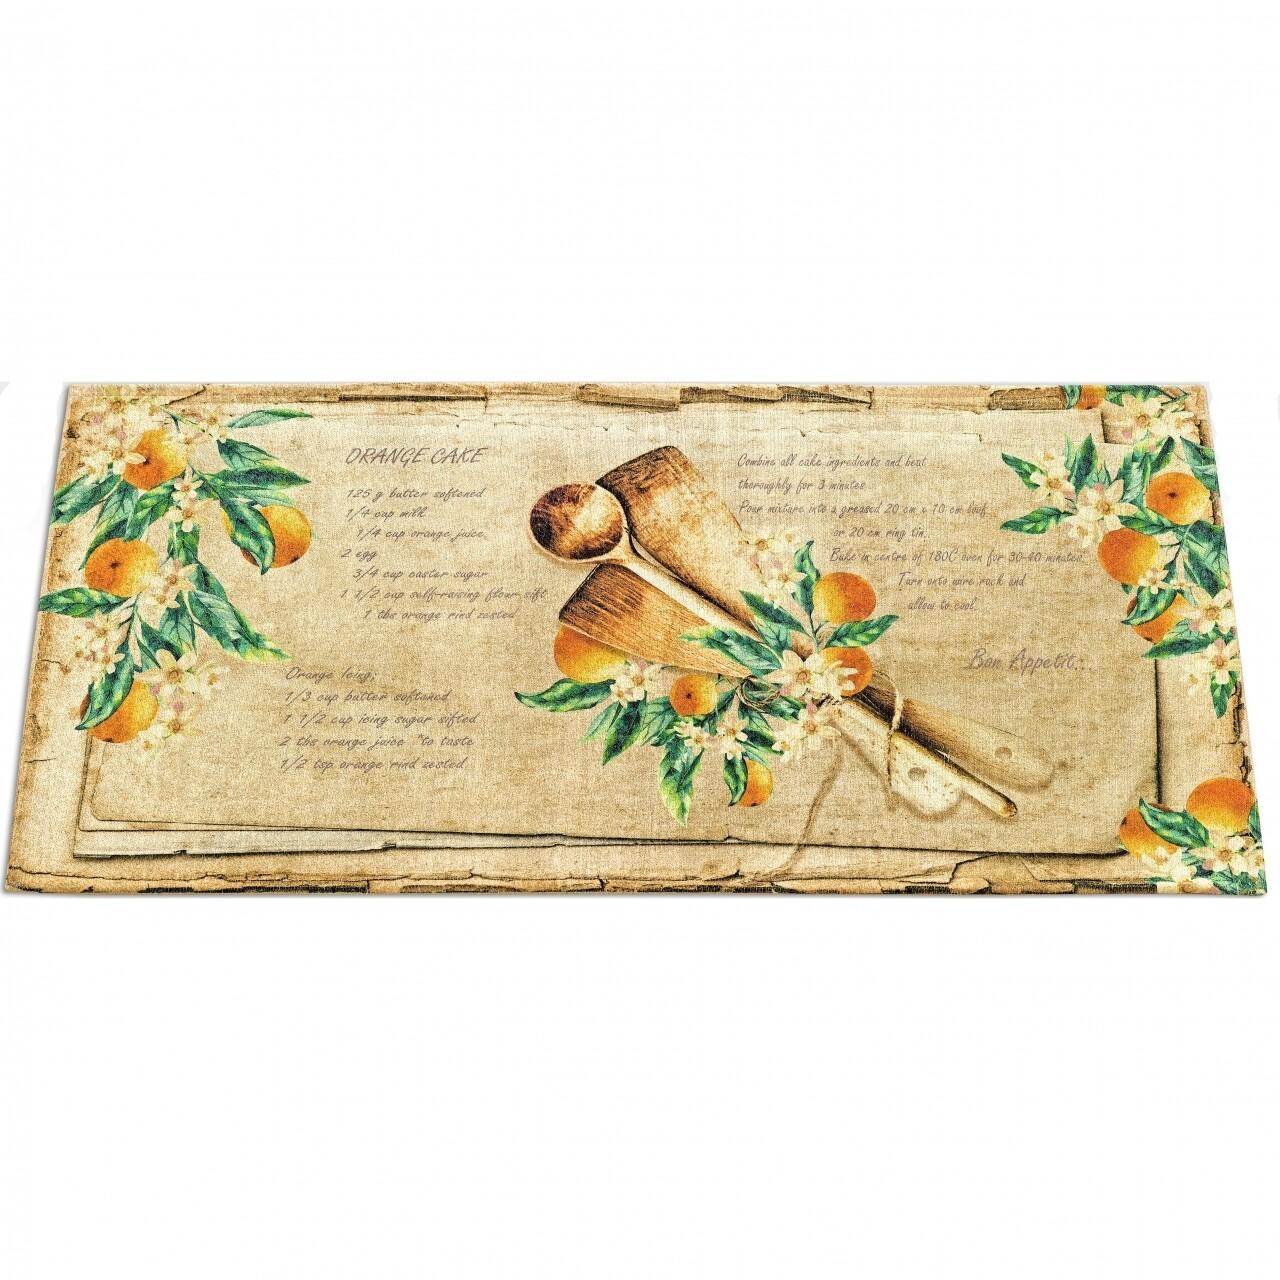 Covor rezistent Webtappeti Bon Appetit 60 x 115 cm, galben/bej